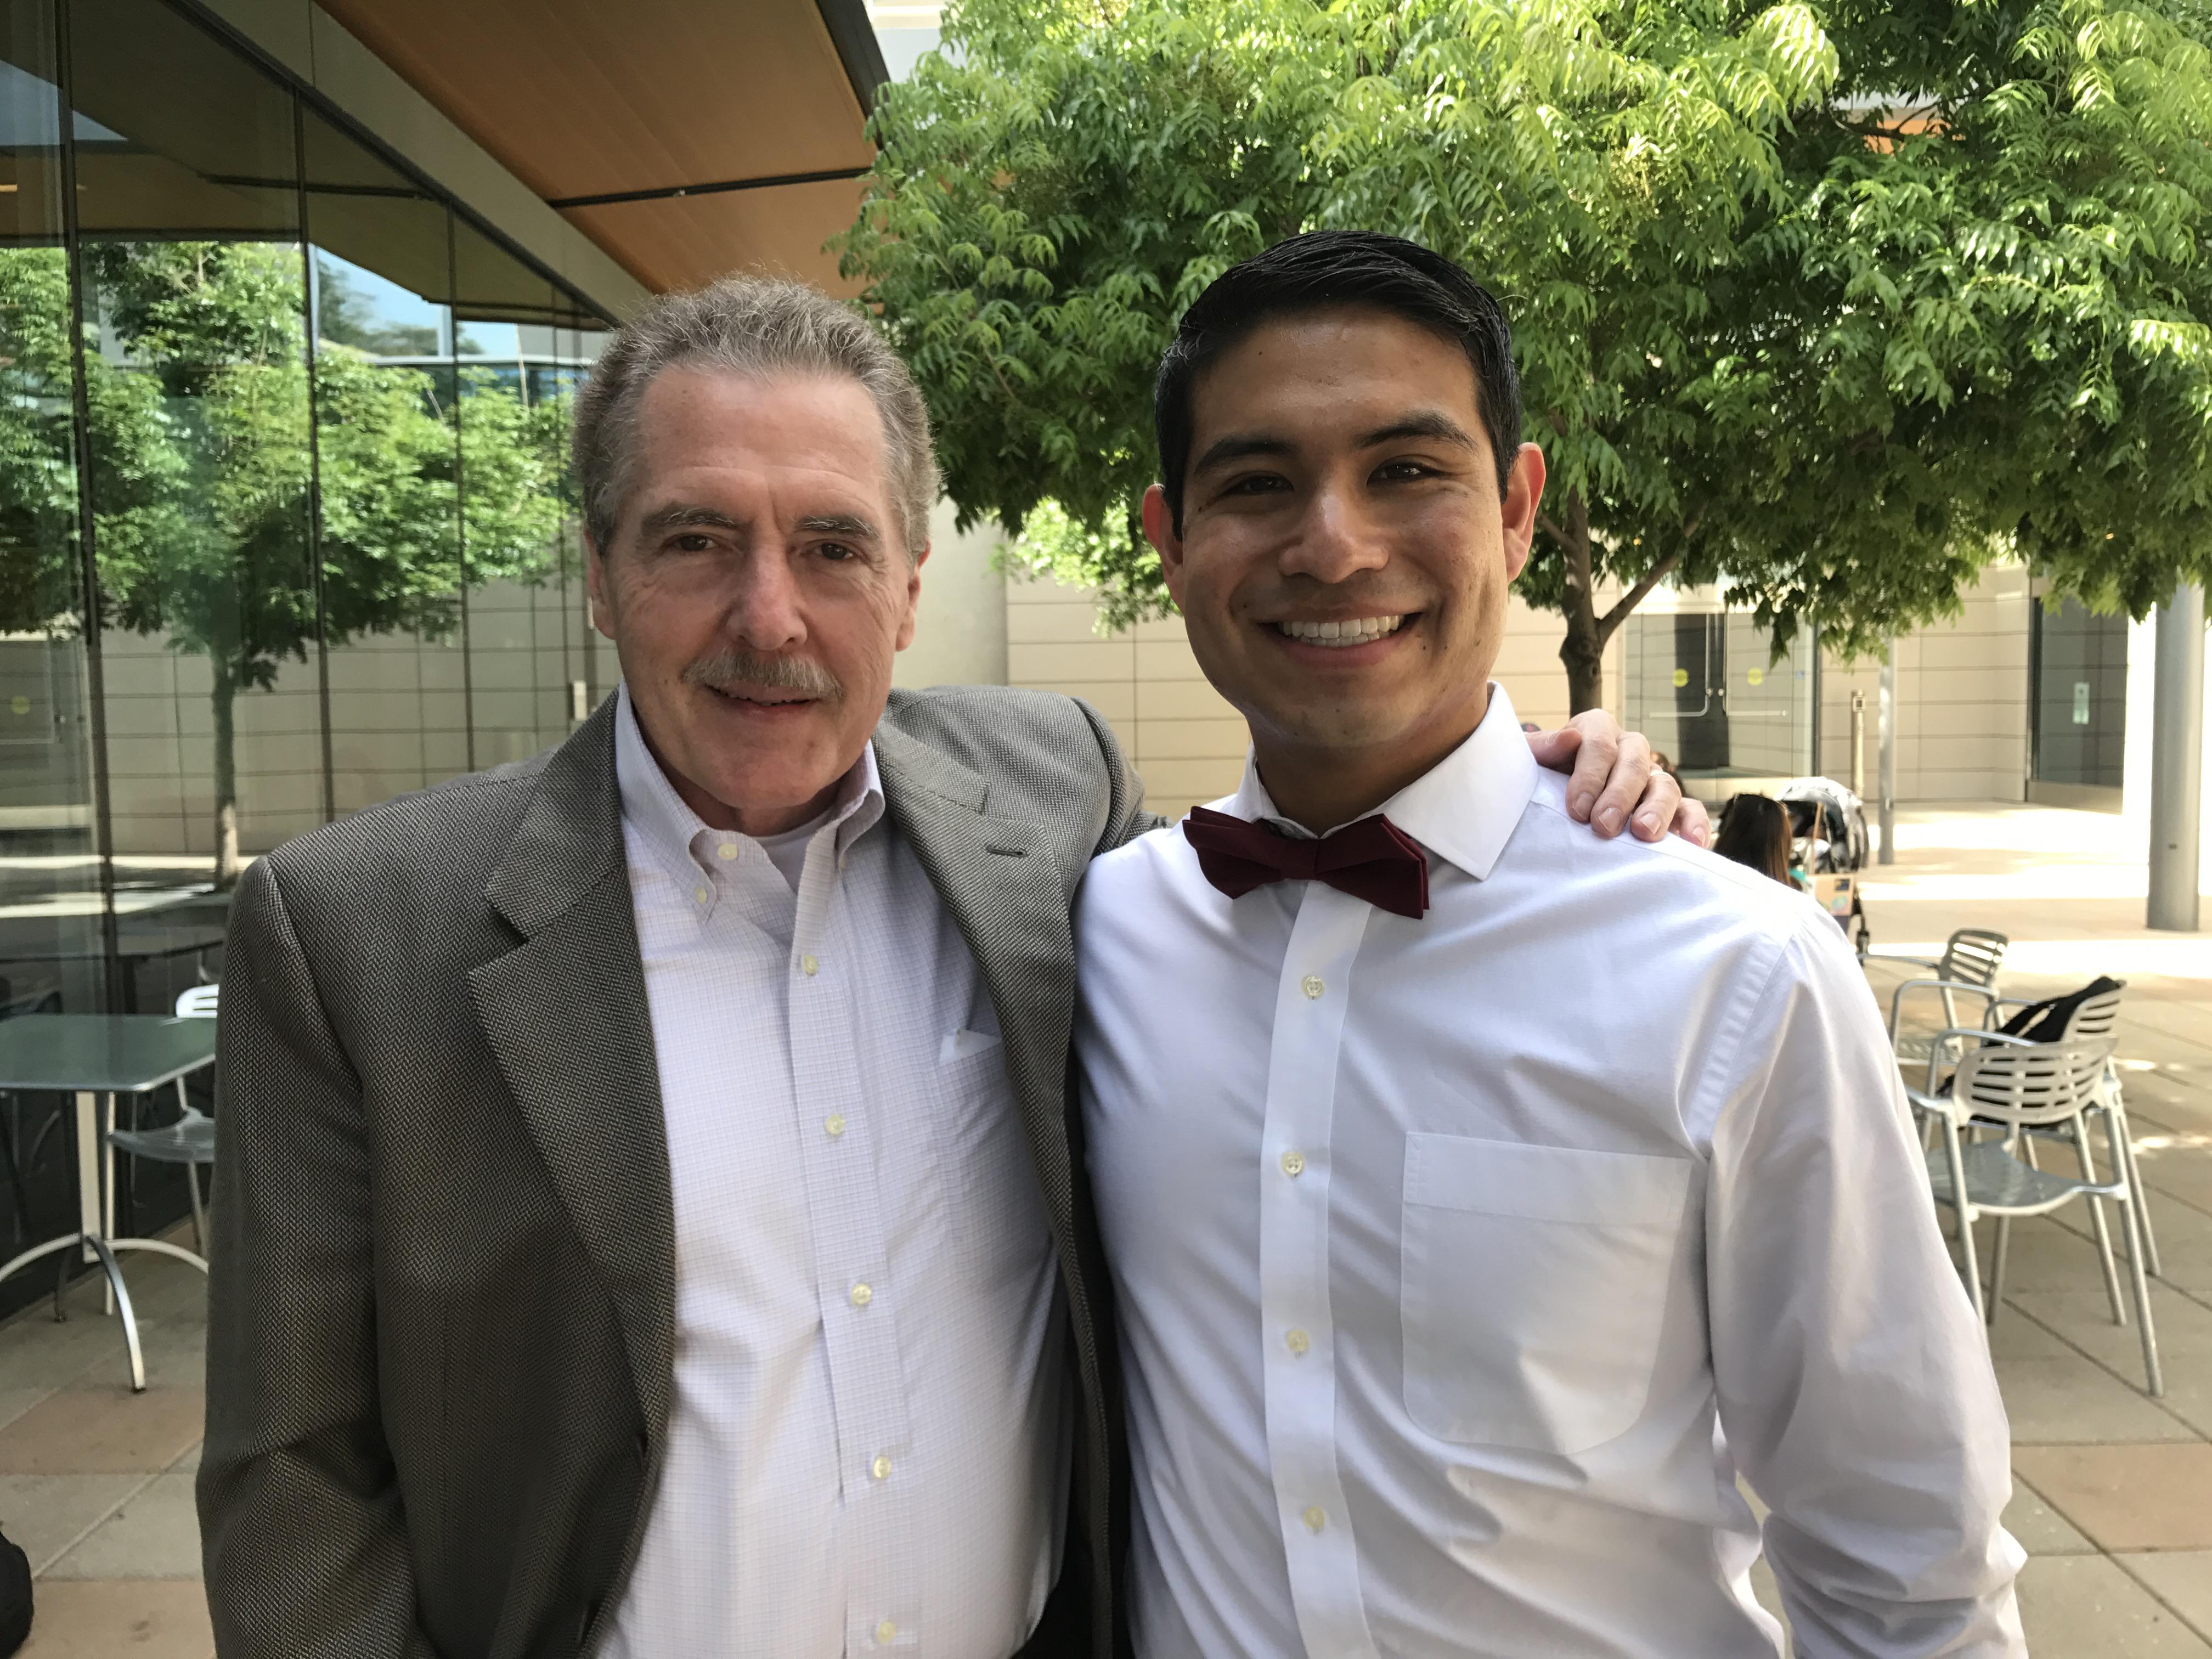 Pedro Espinoza with Jack Larson, Giving with Jack Larson.